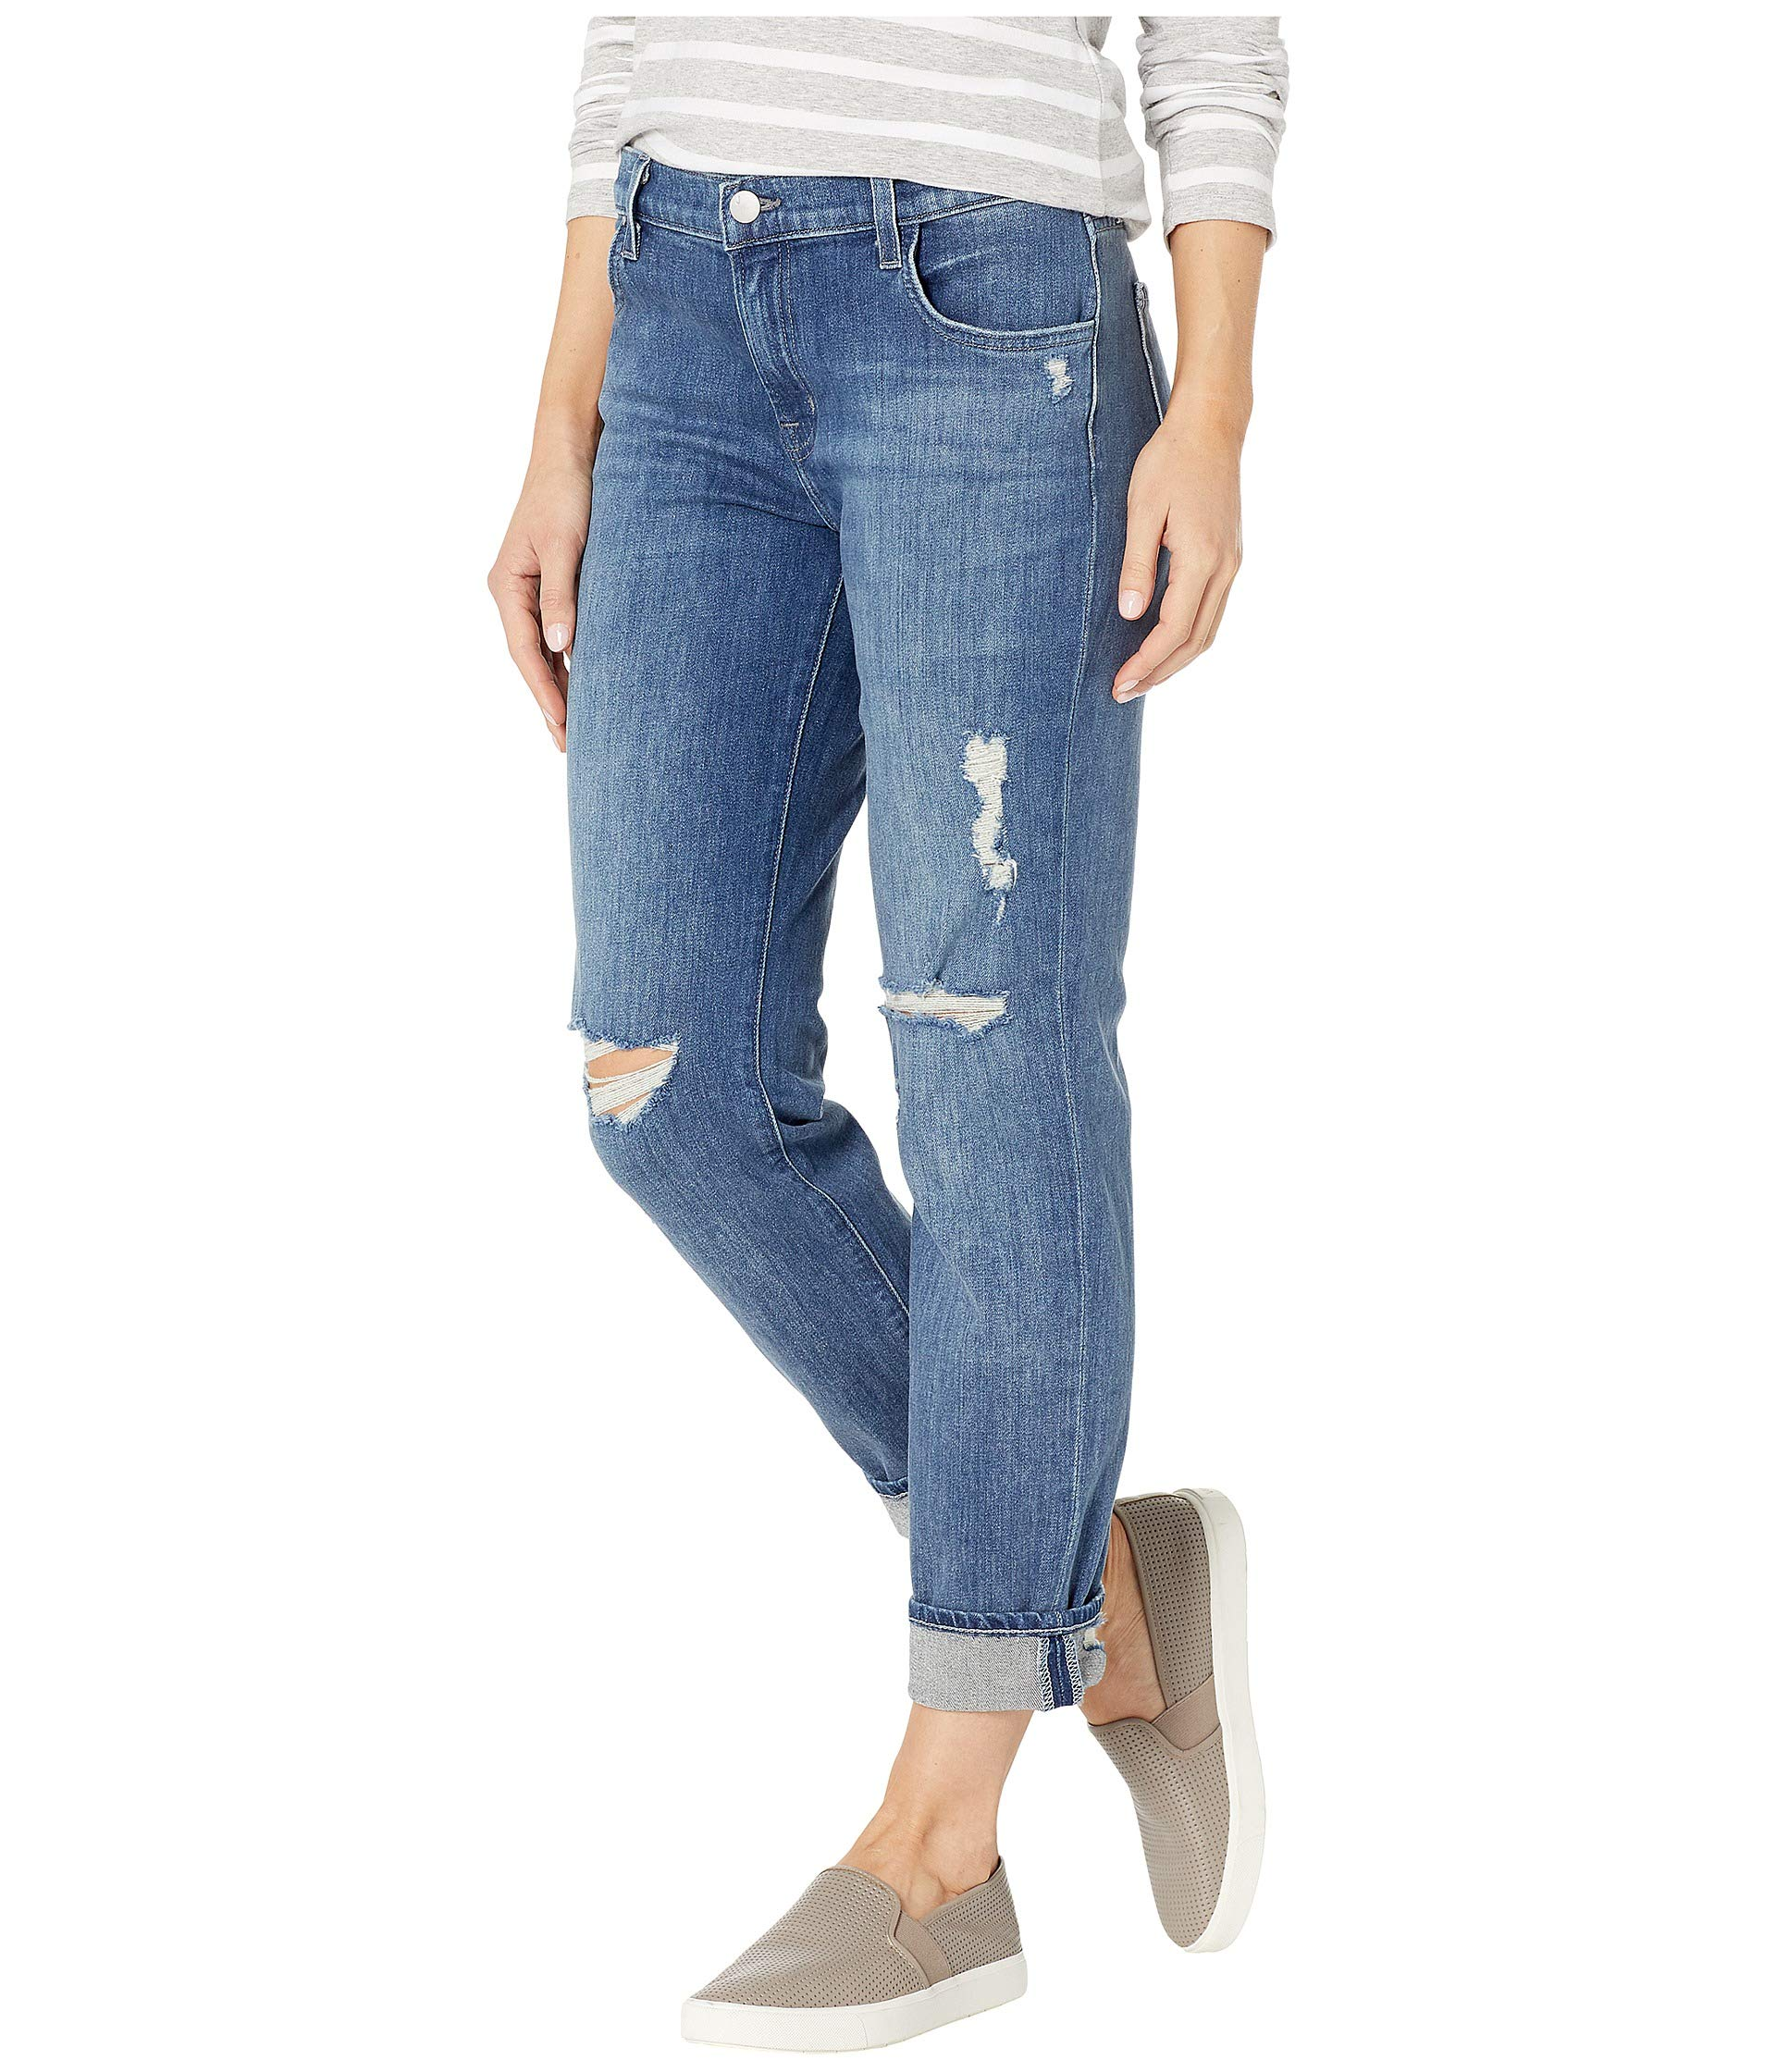 Mid Fit Johnny J rise Brand In Destruct Boy Jeans Redemption qPB41Ewx